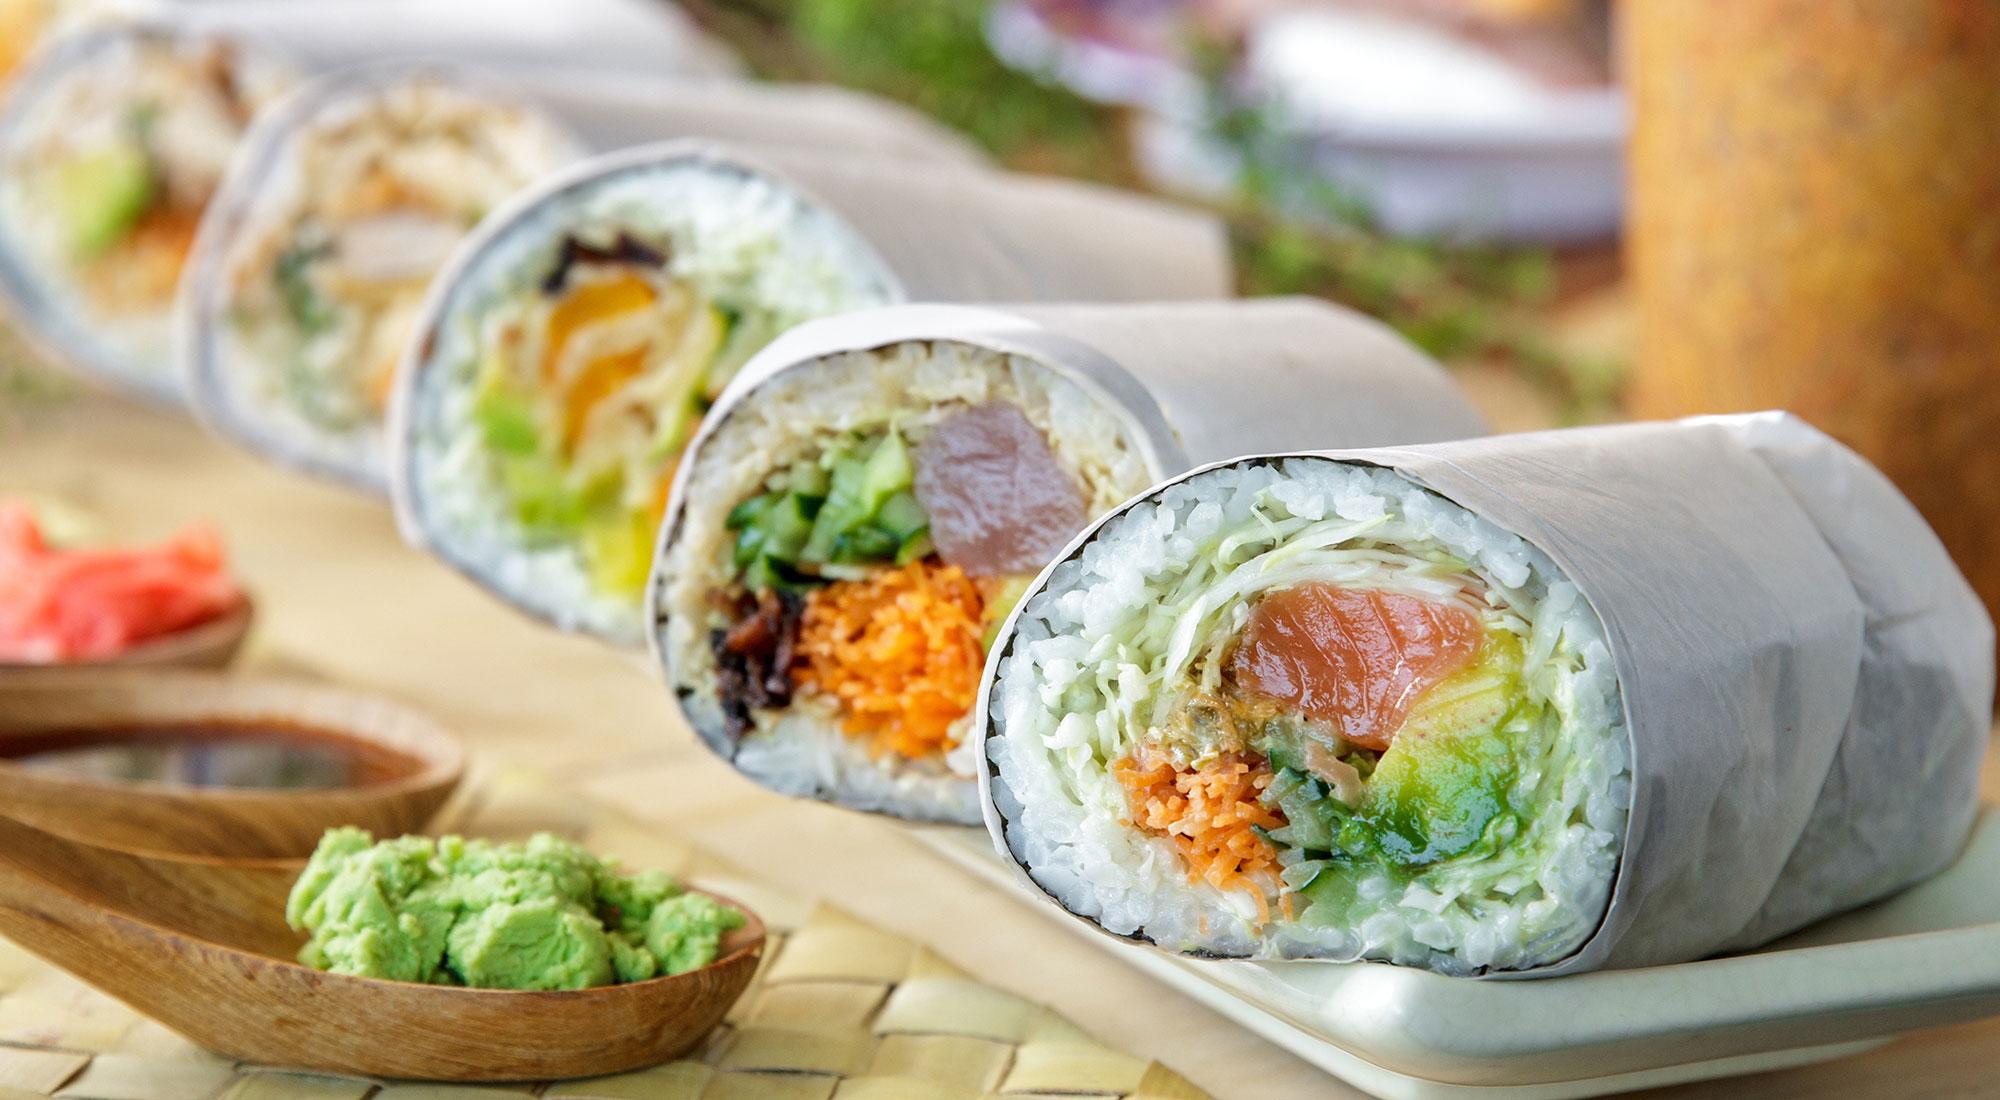 Sushi burrito restaurant coming to Houston - Houston Chronicle